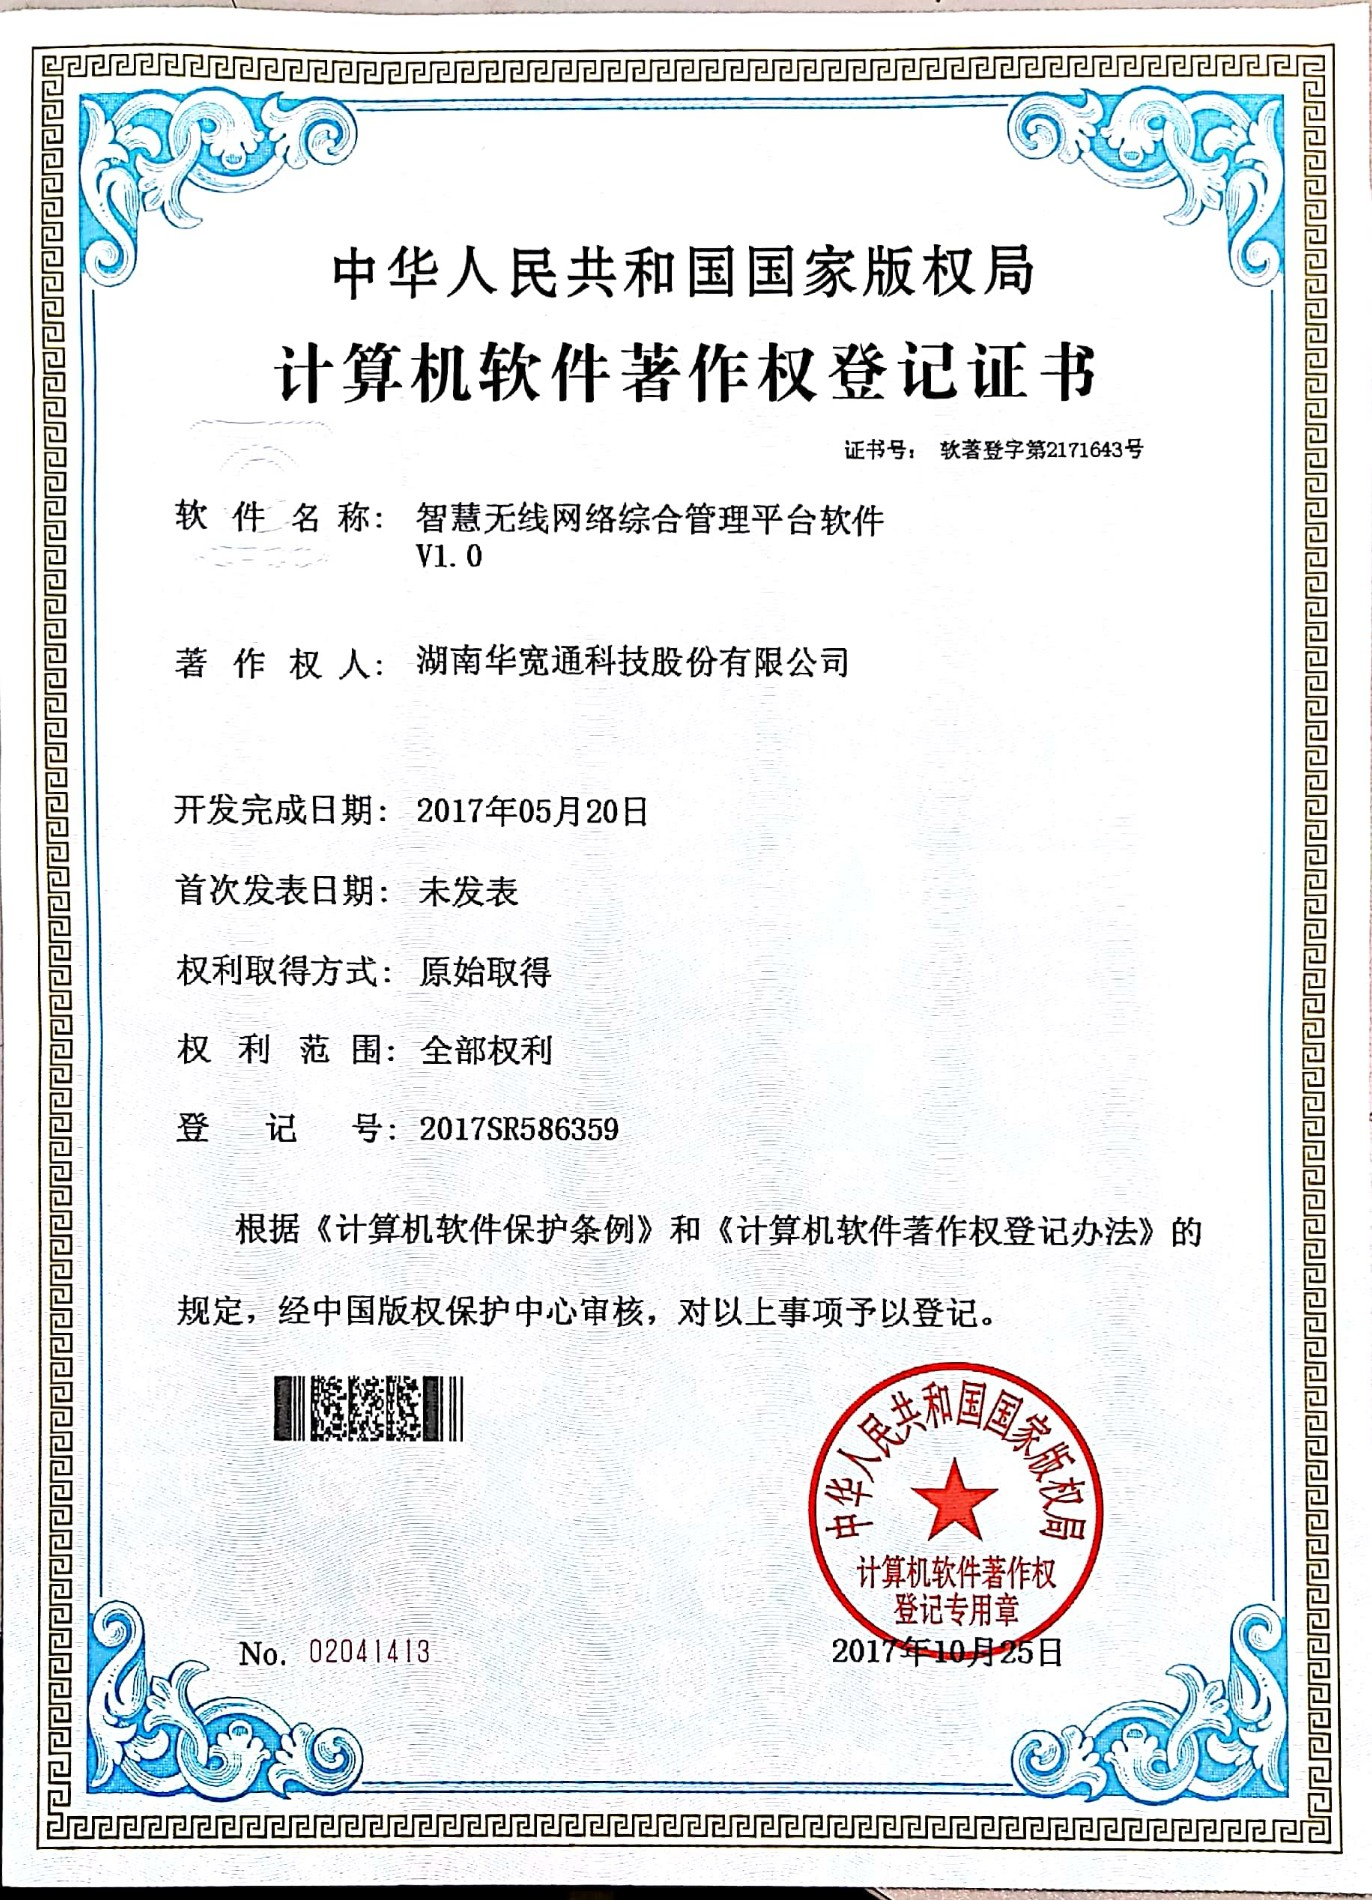 Computer software copyright registration 2